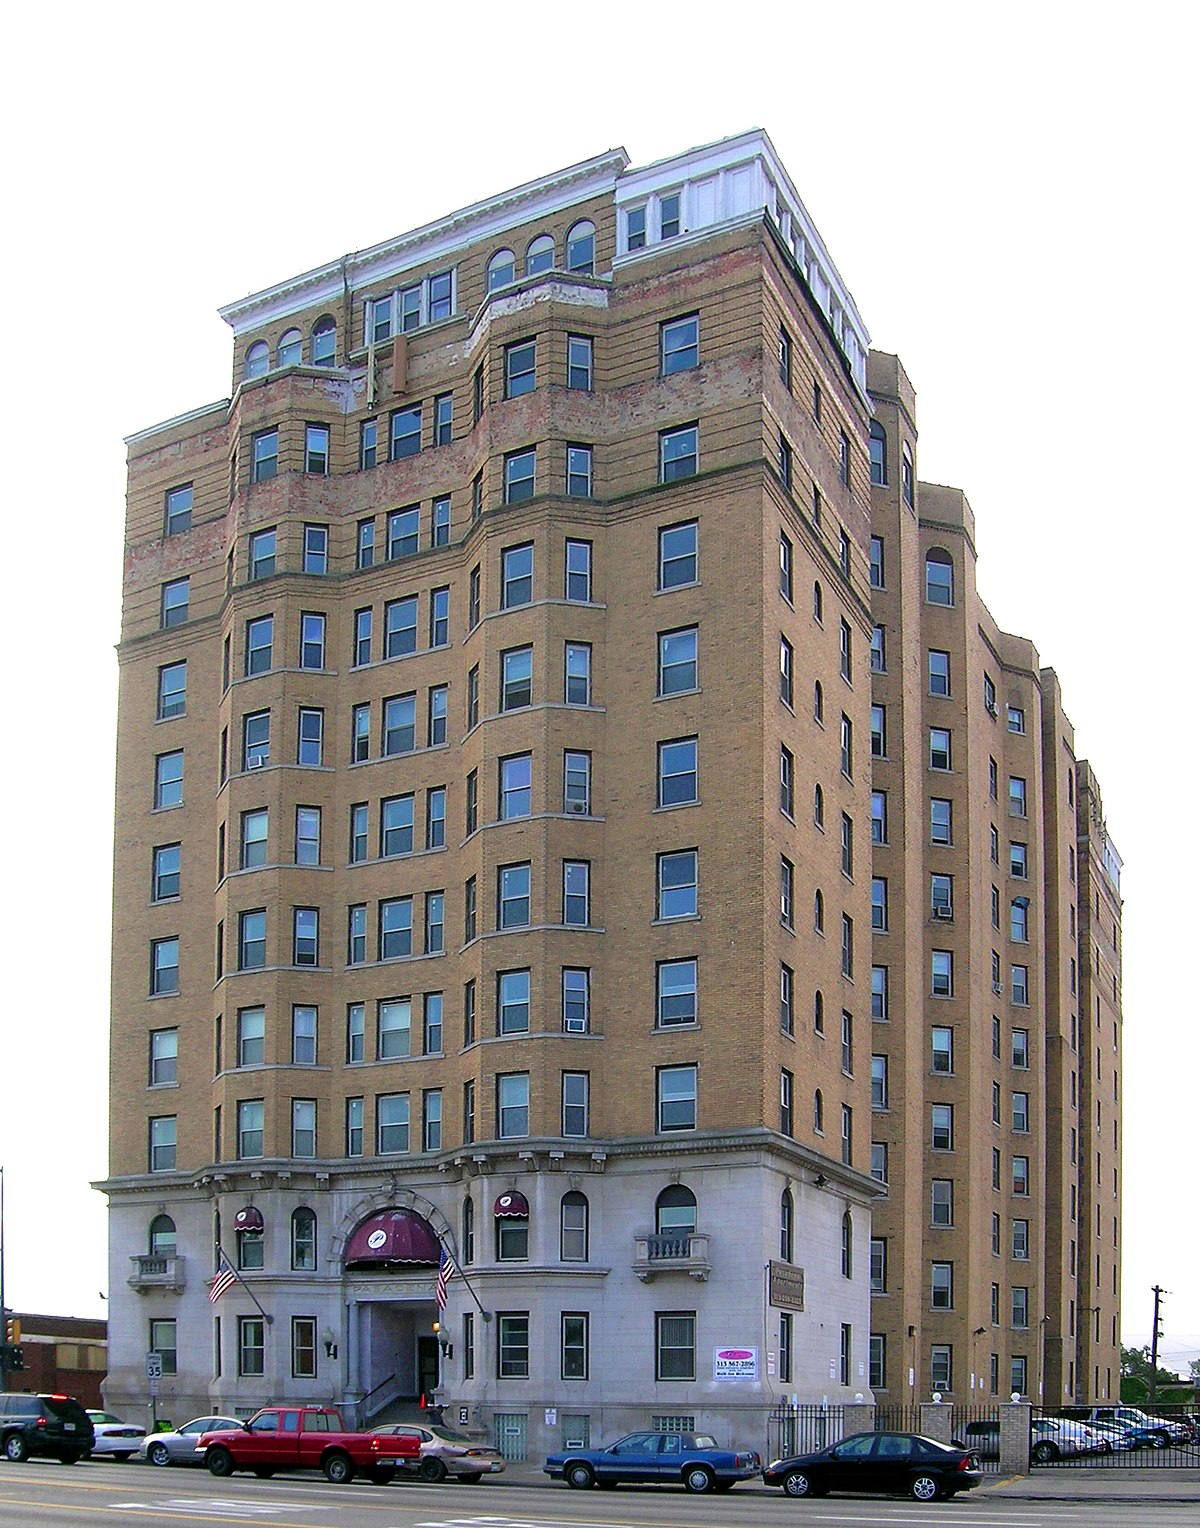 Pasadena Apartments - Wikipedia